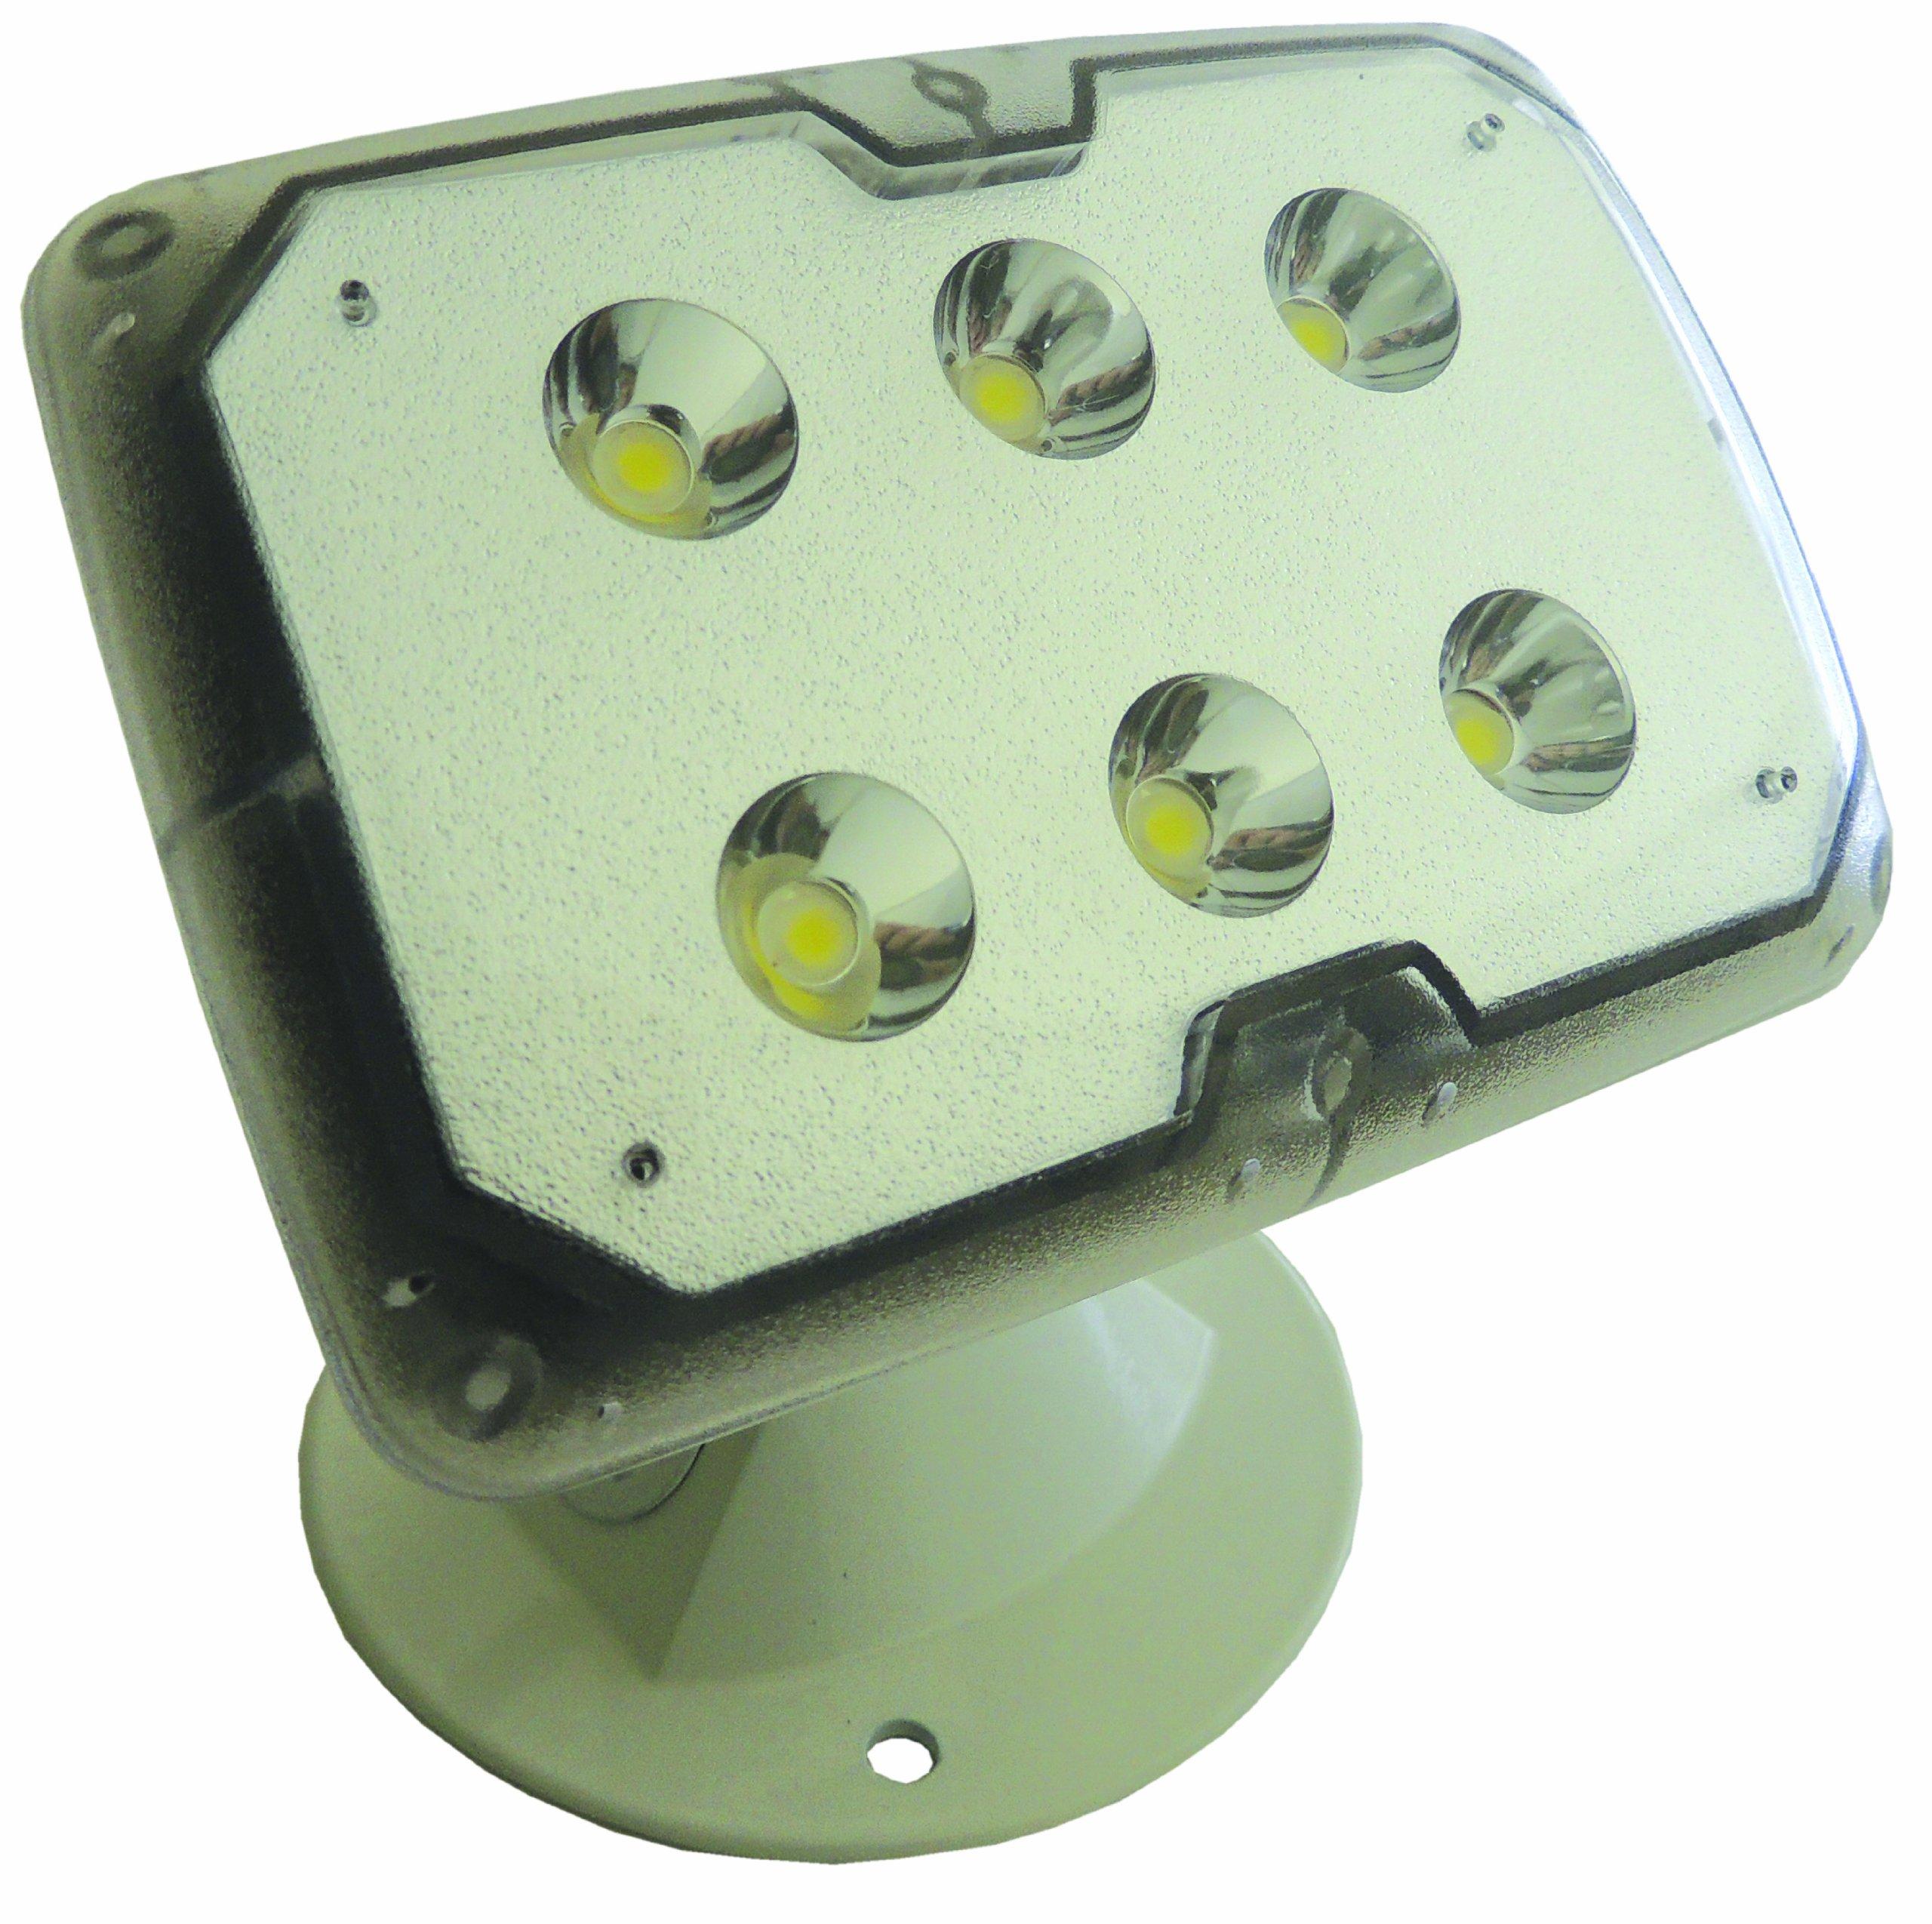 Lumateq LL51-WHA-110-00 LED Security Light, 6-watt, White